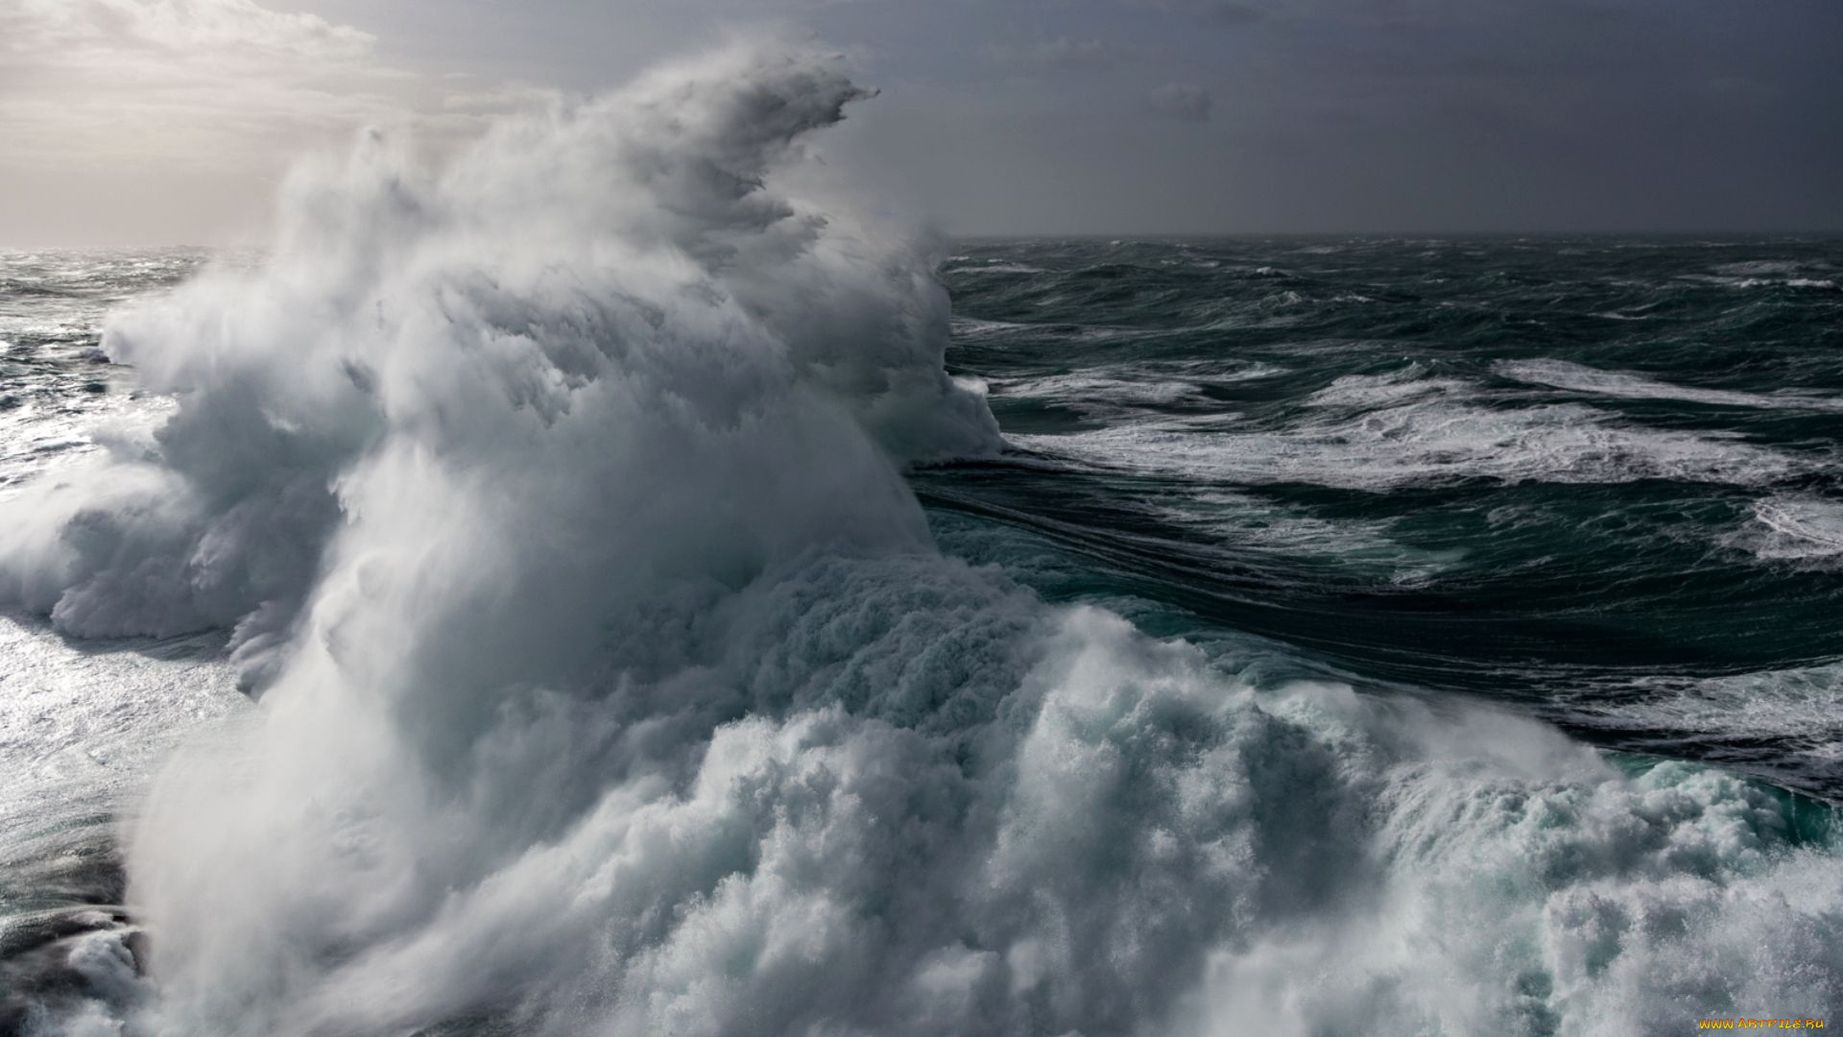 океан в шторм фото тук туки